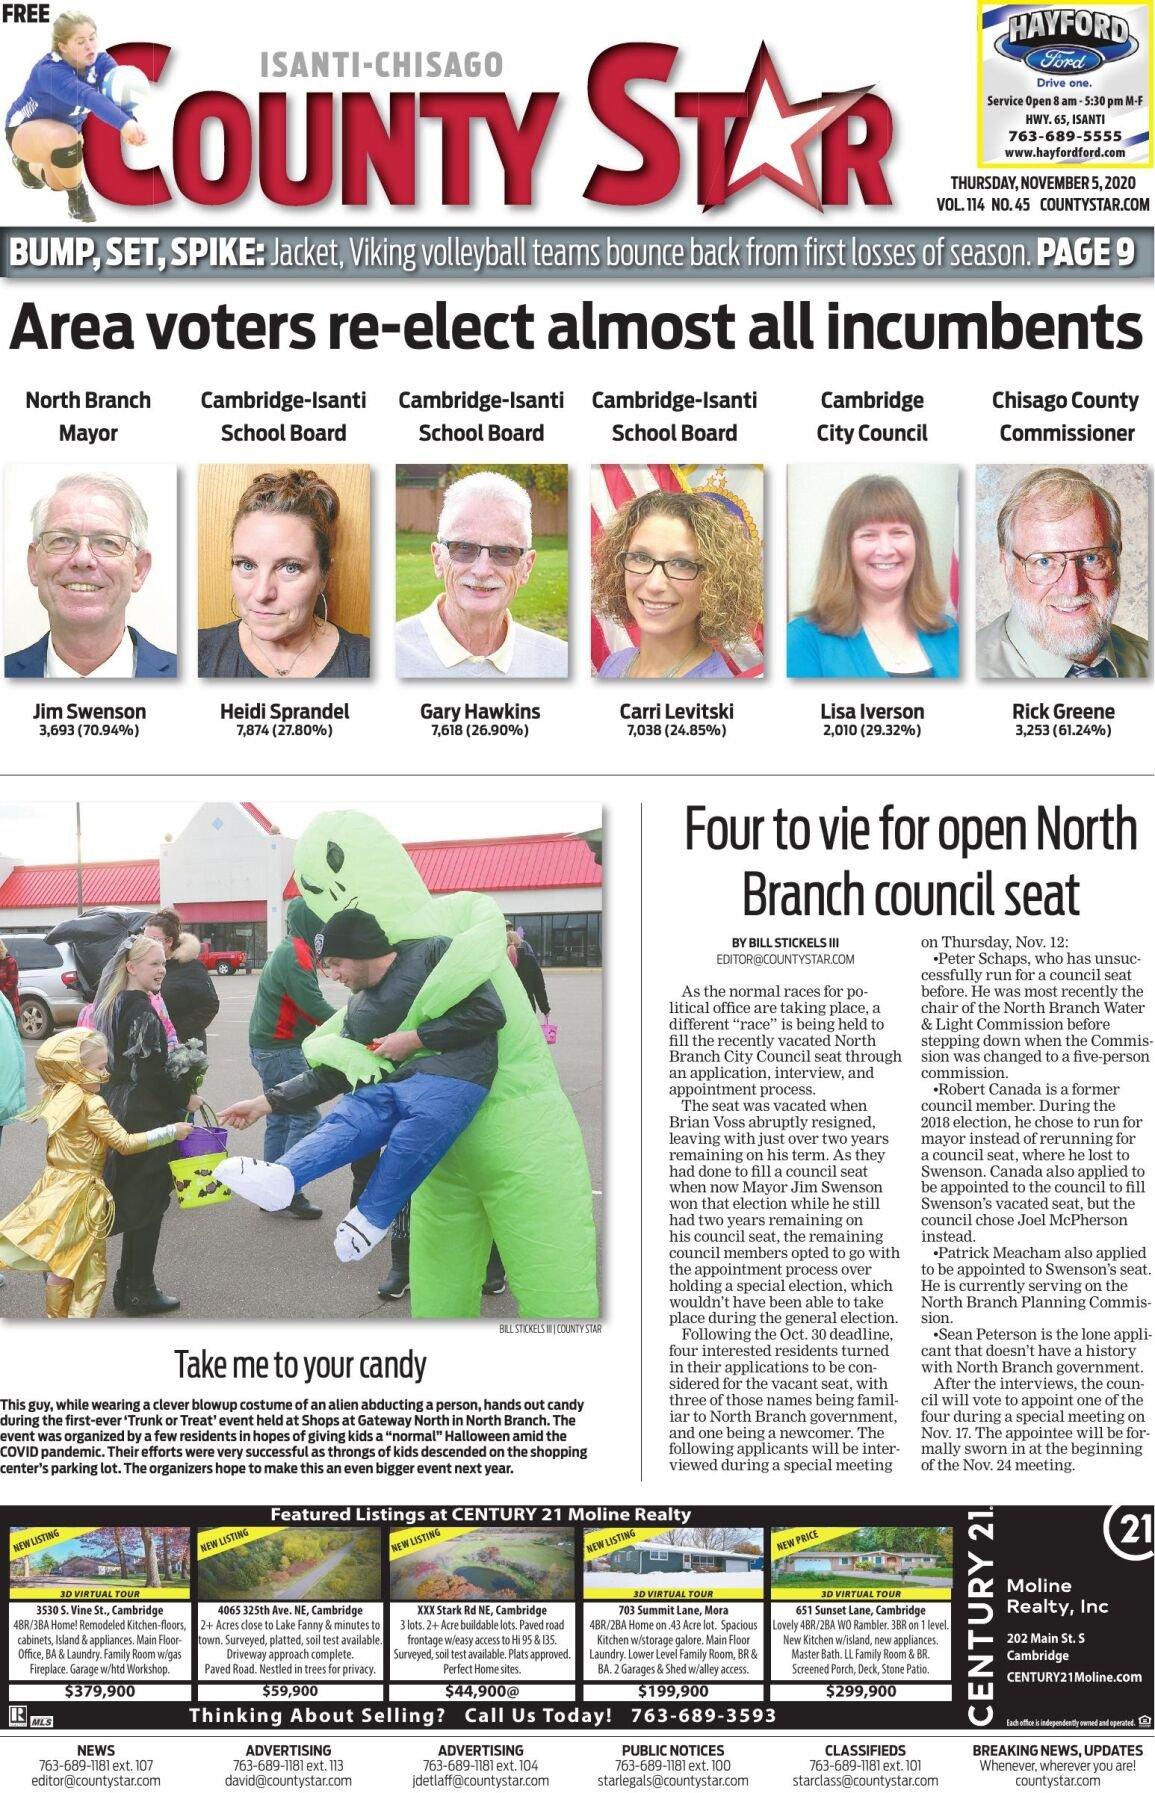 Isanti-Chisago County Star November 5, 2020 e-edition